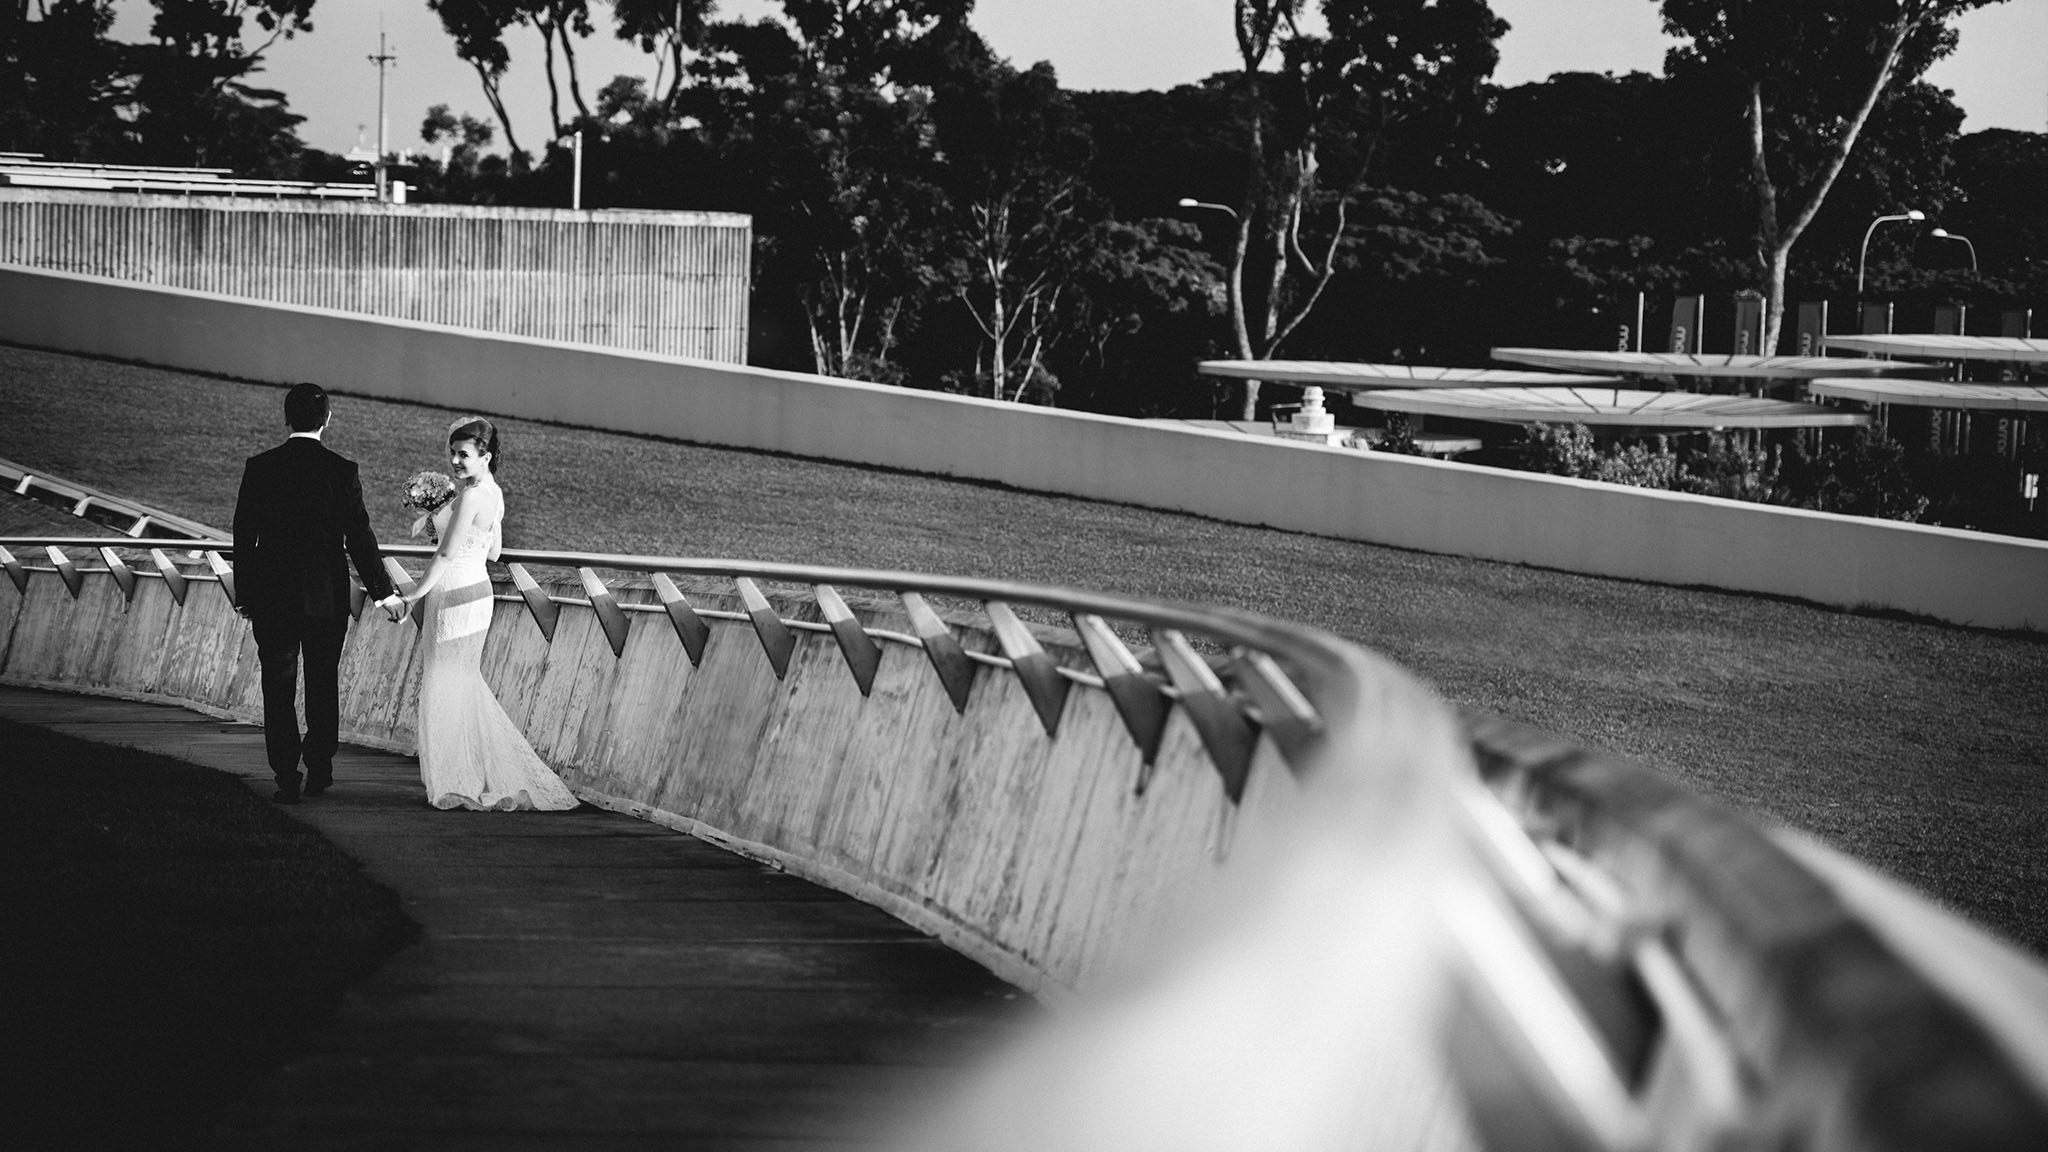 01 Prewedding Marina Barrage 00015.JPG